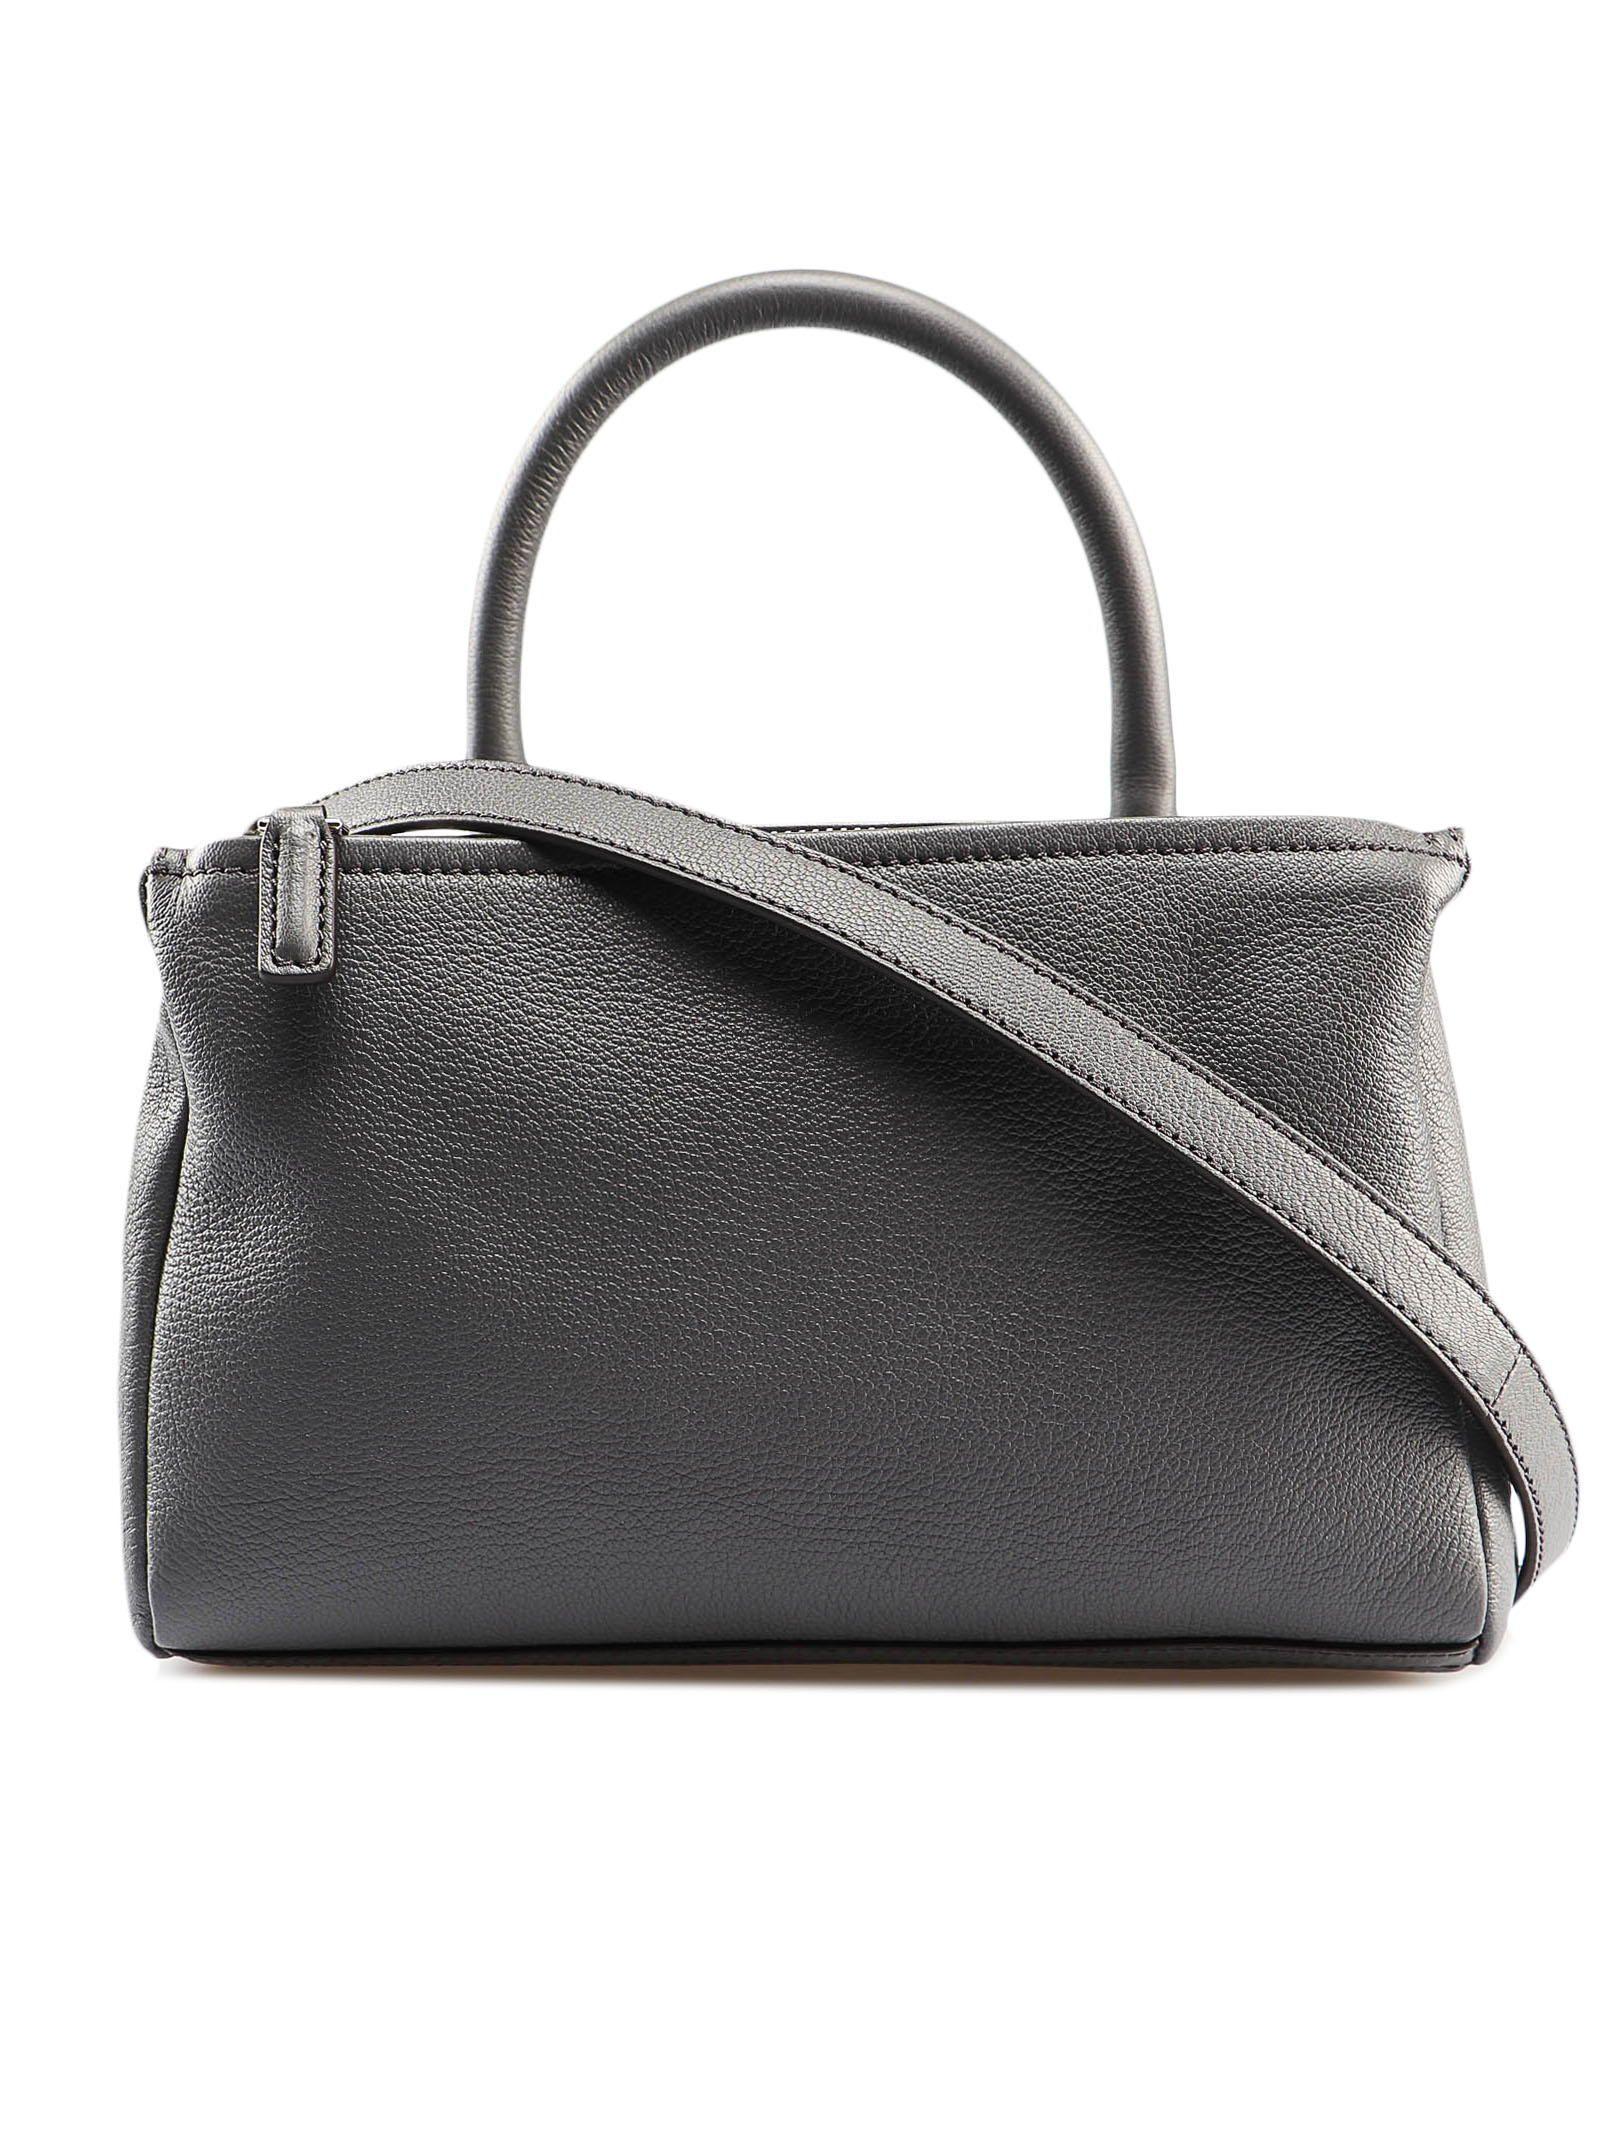 1c34d253401 Givenchy Givenchy Pandora Mini Bag - Storm Grey - 10965603 | italist